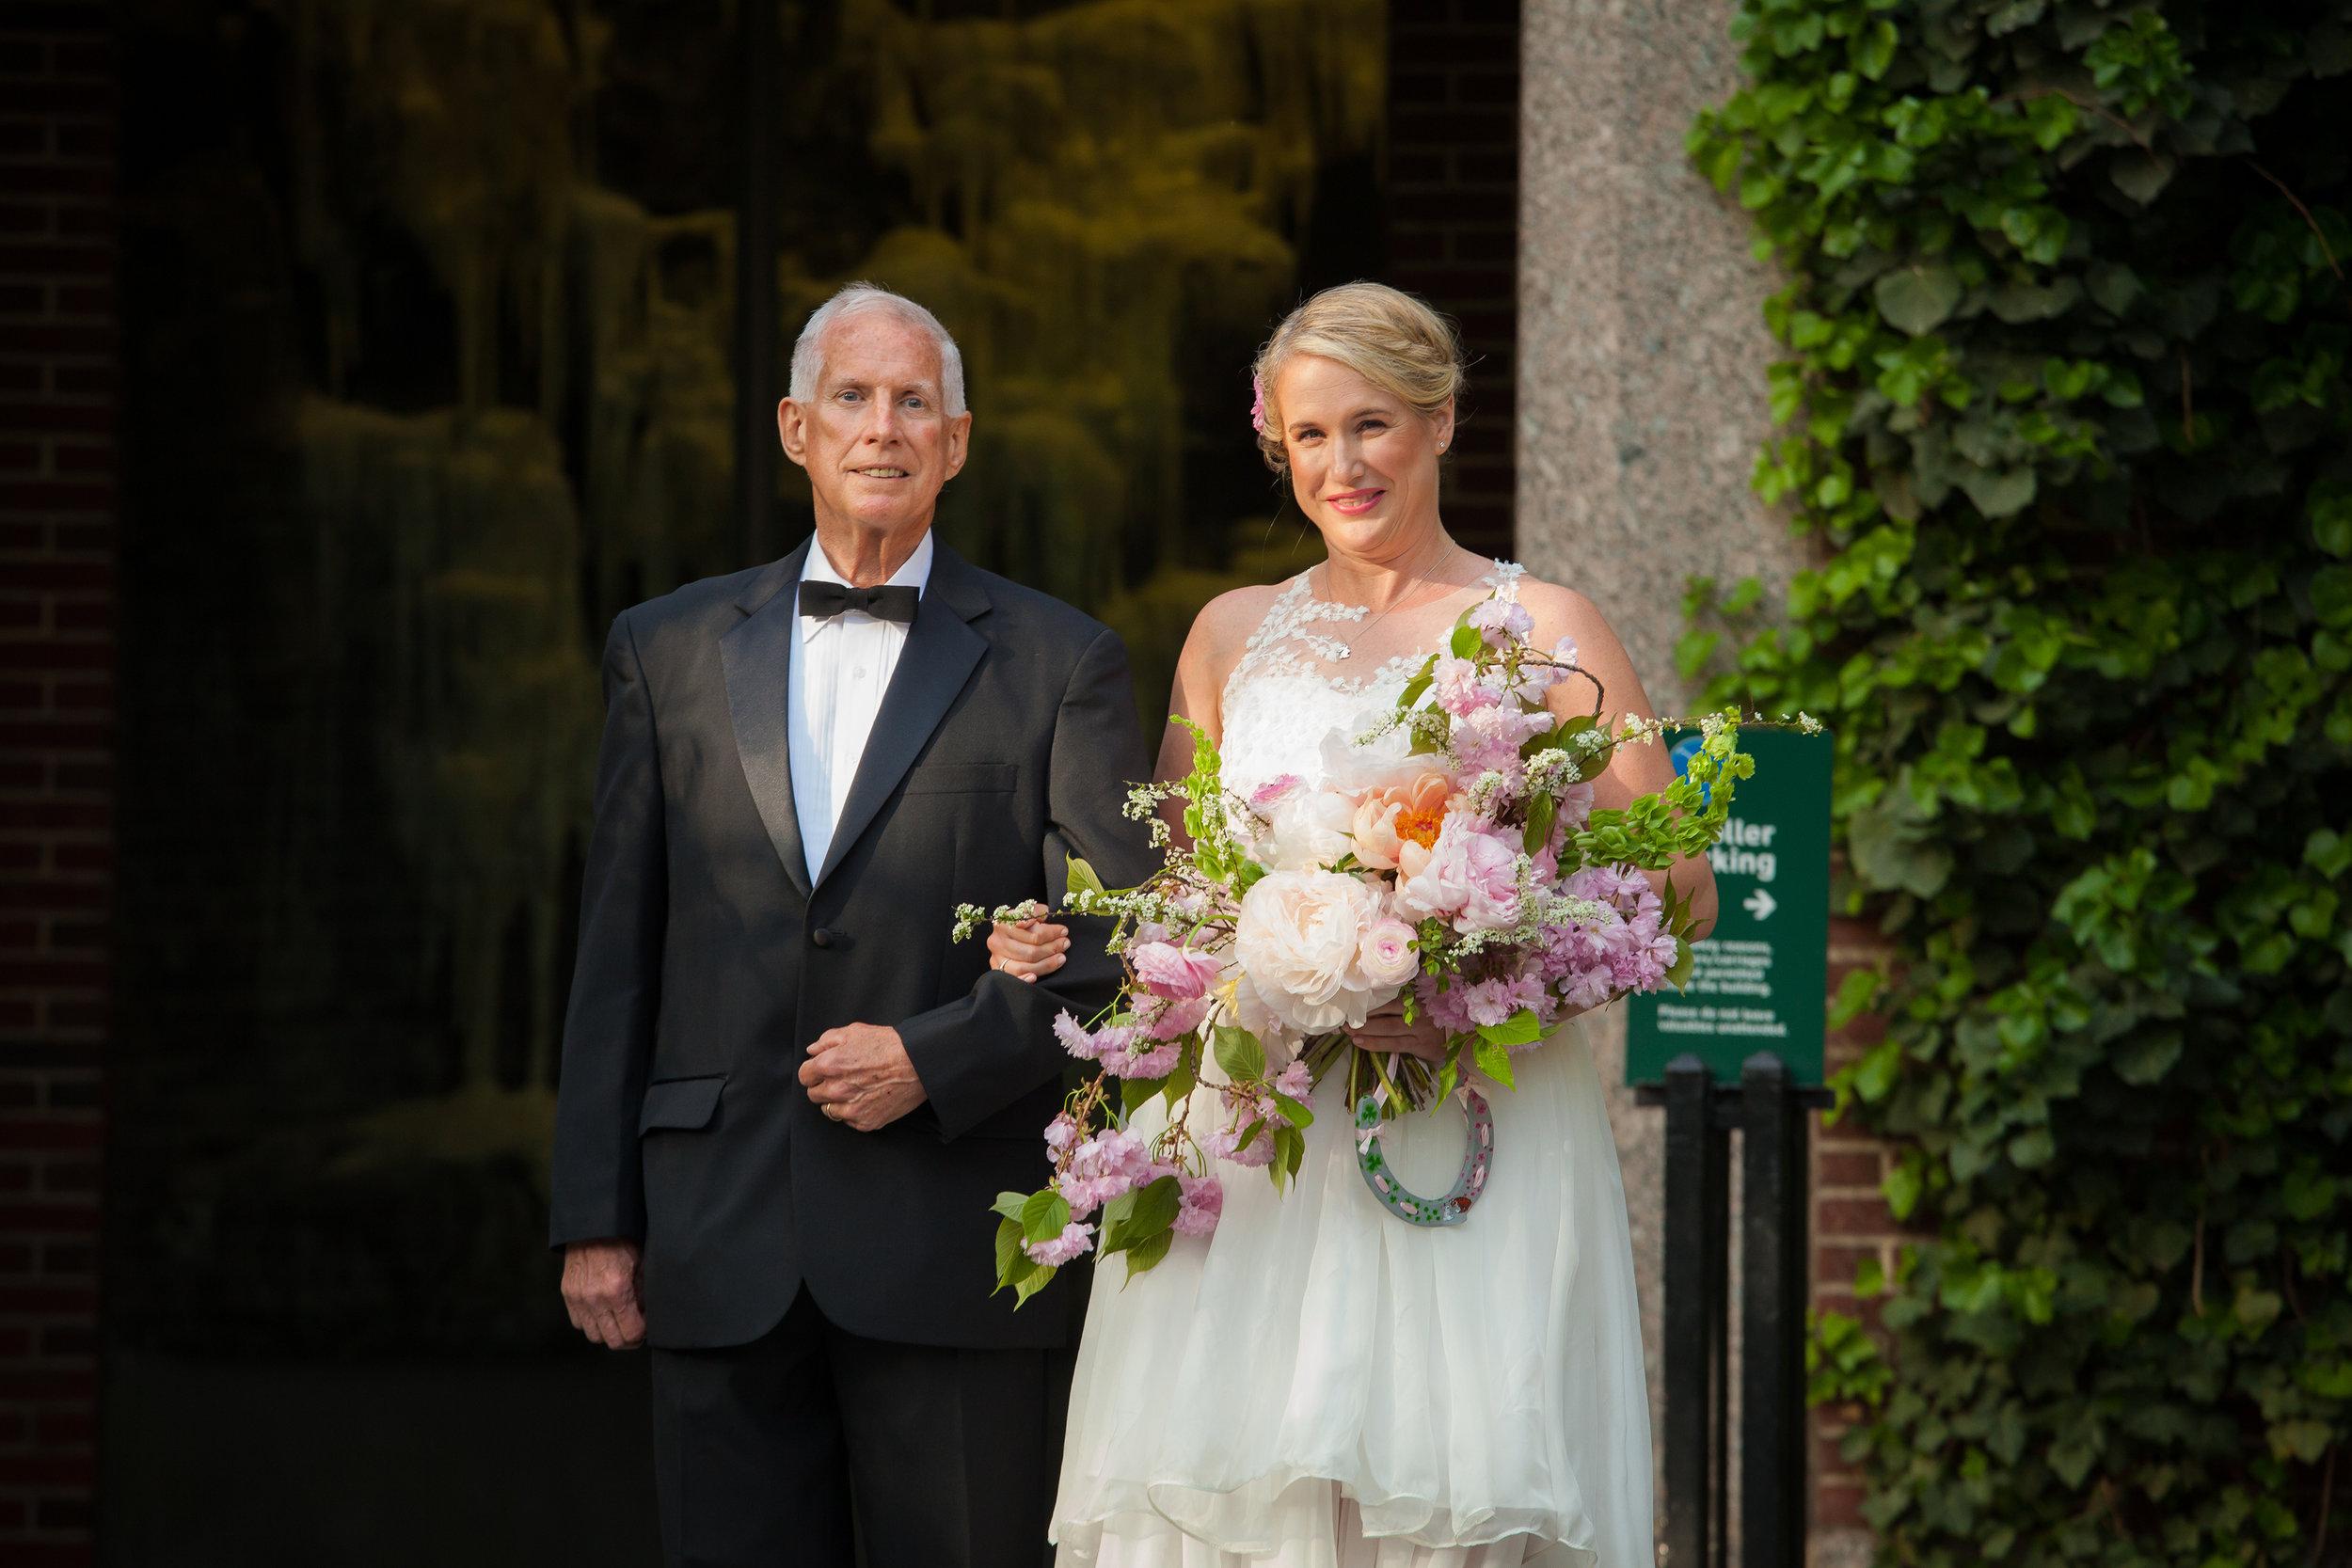 victorious-events-nyc-019-colleen-taka-central-park-zoo-wedding-raymond-hamlin.jpg